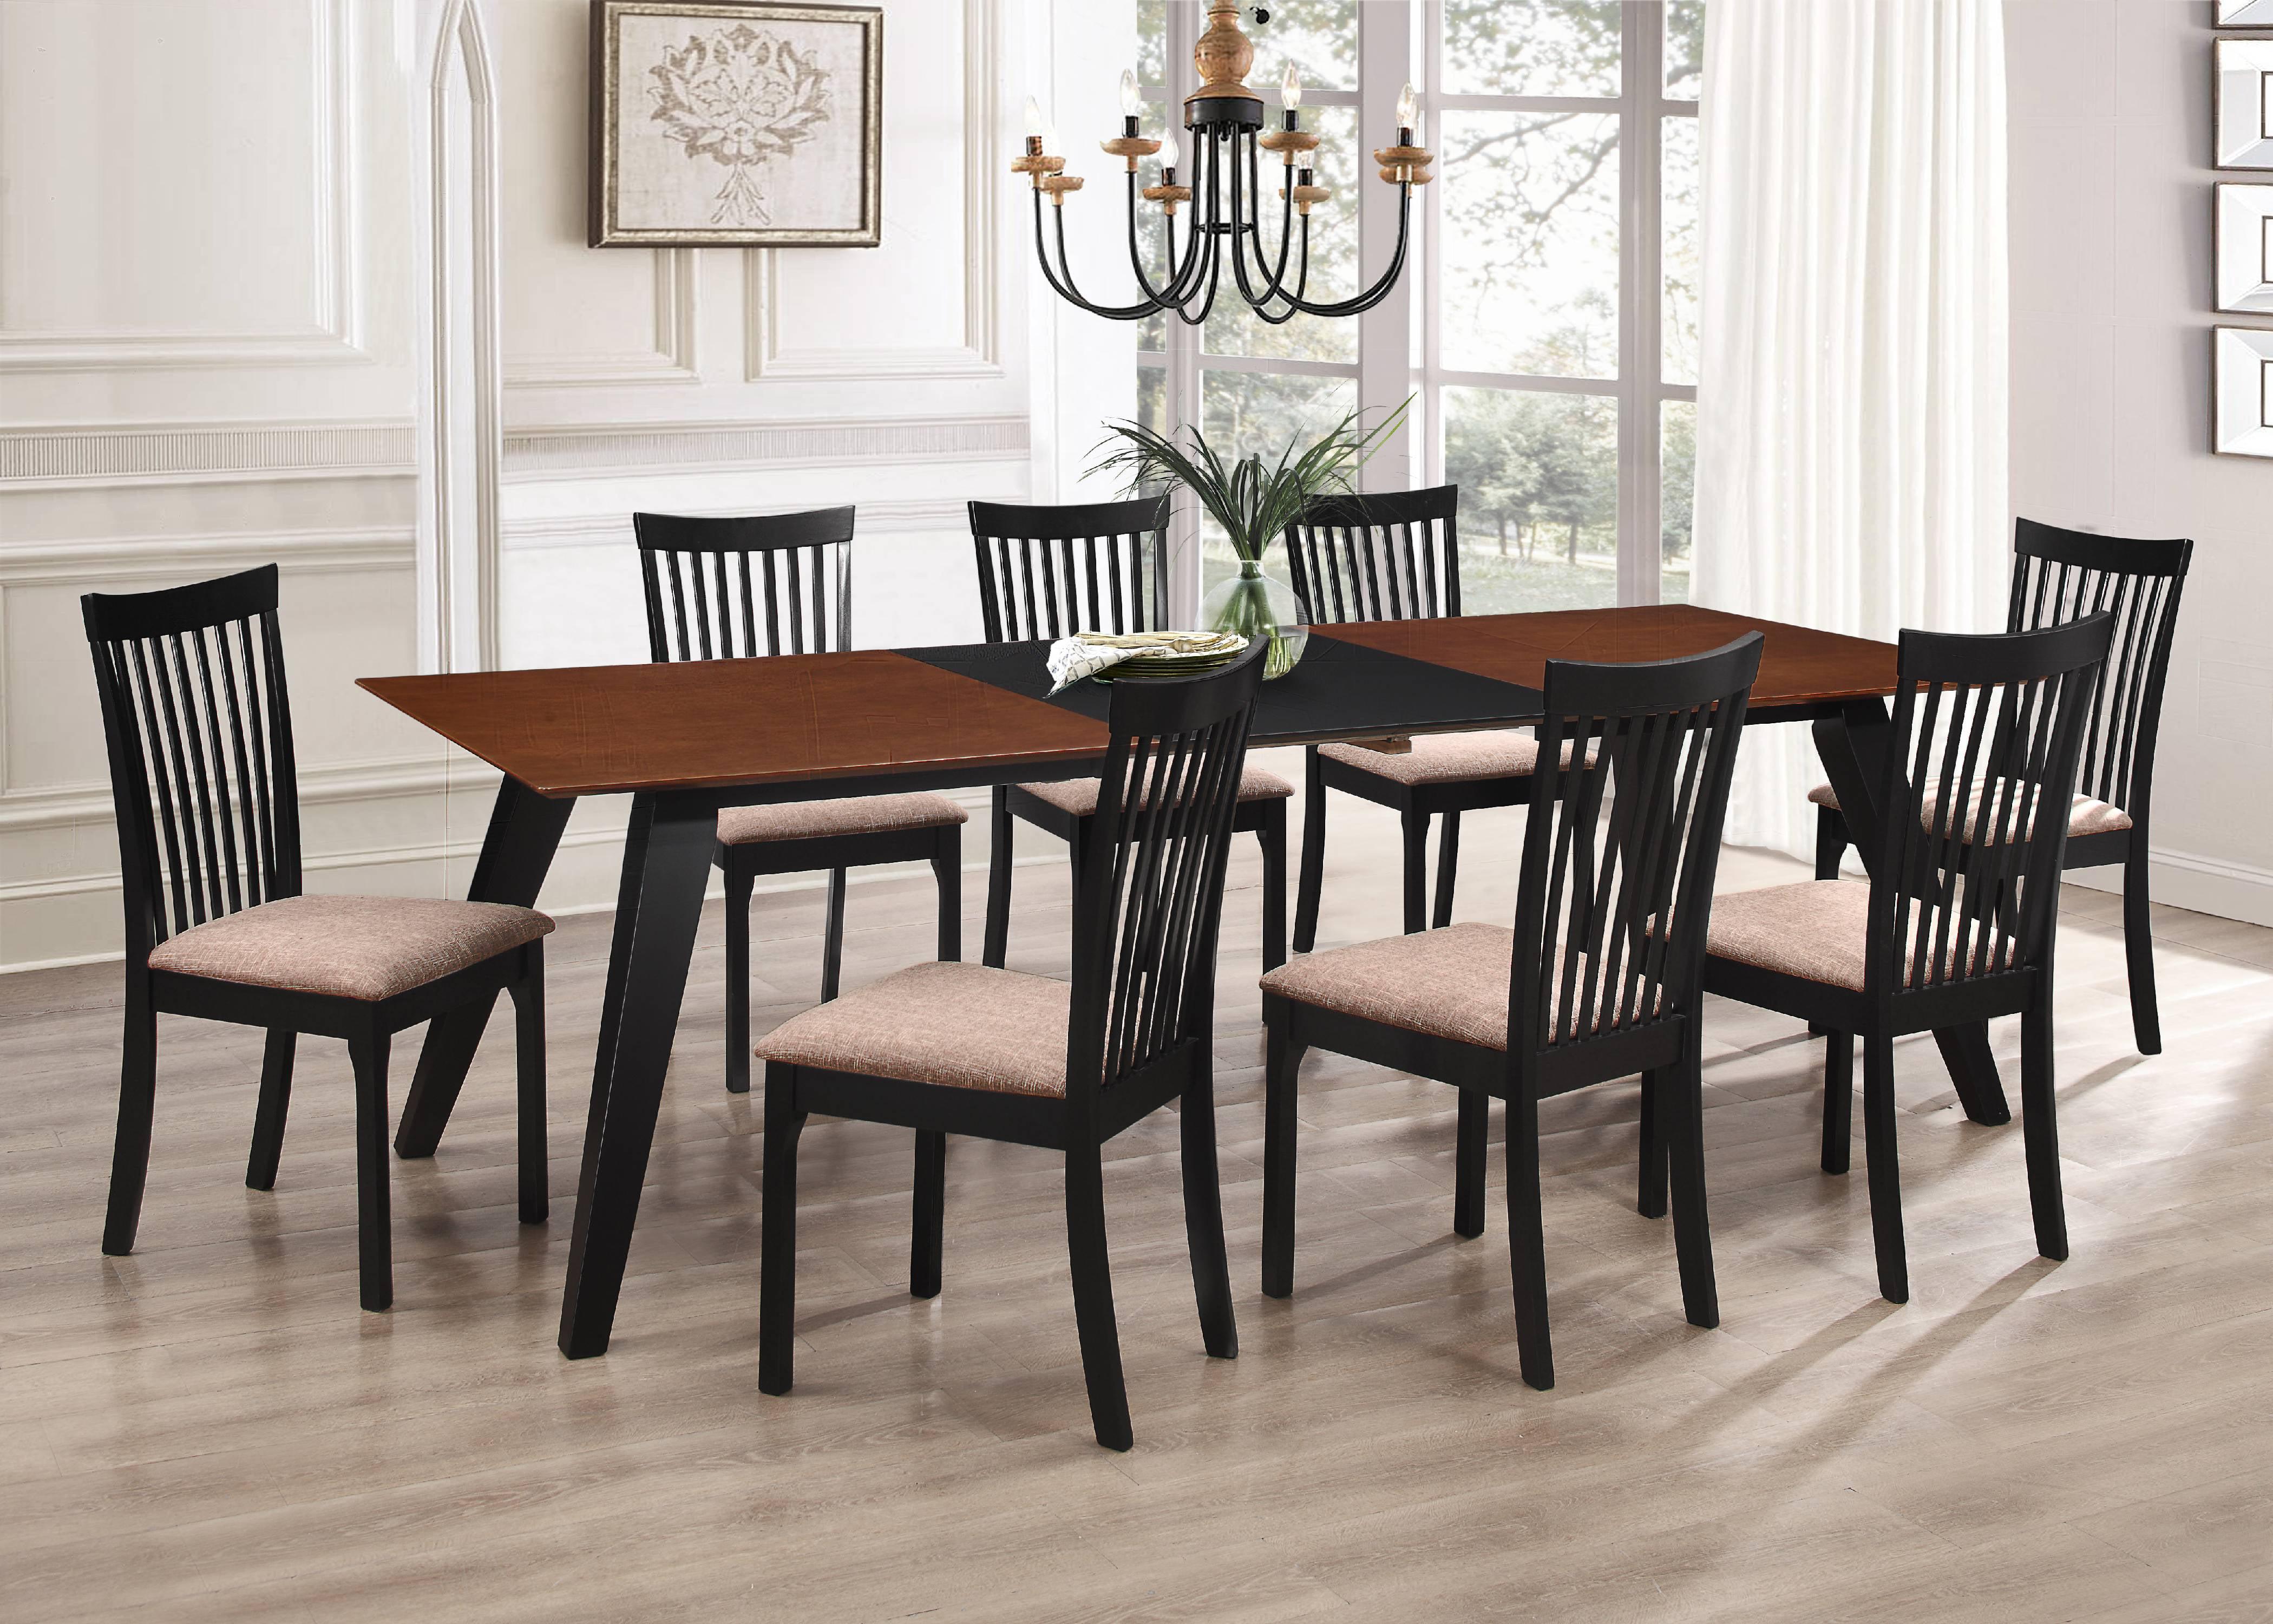 Verona 9 Piece Formal Dining Room Set Walnut Black Wood